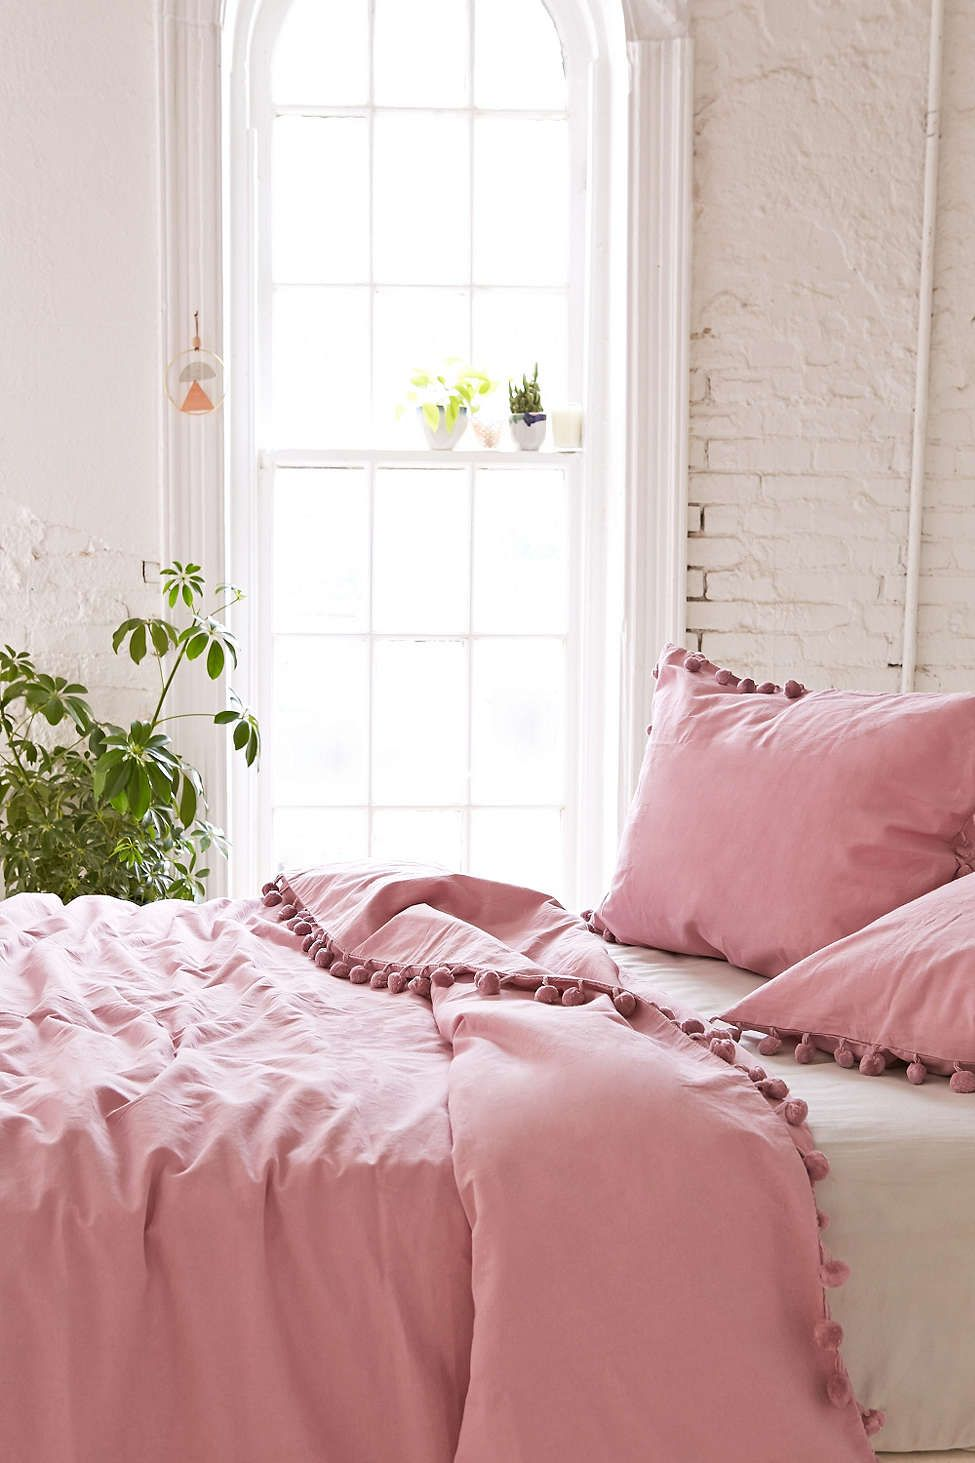 cotton set tale novelux cover door products duvet close pink fairy up